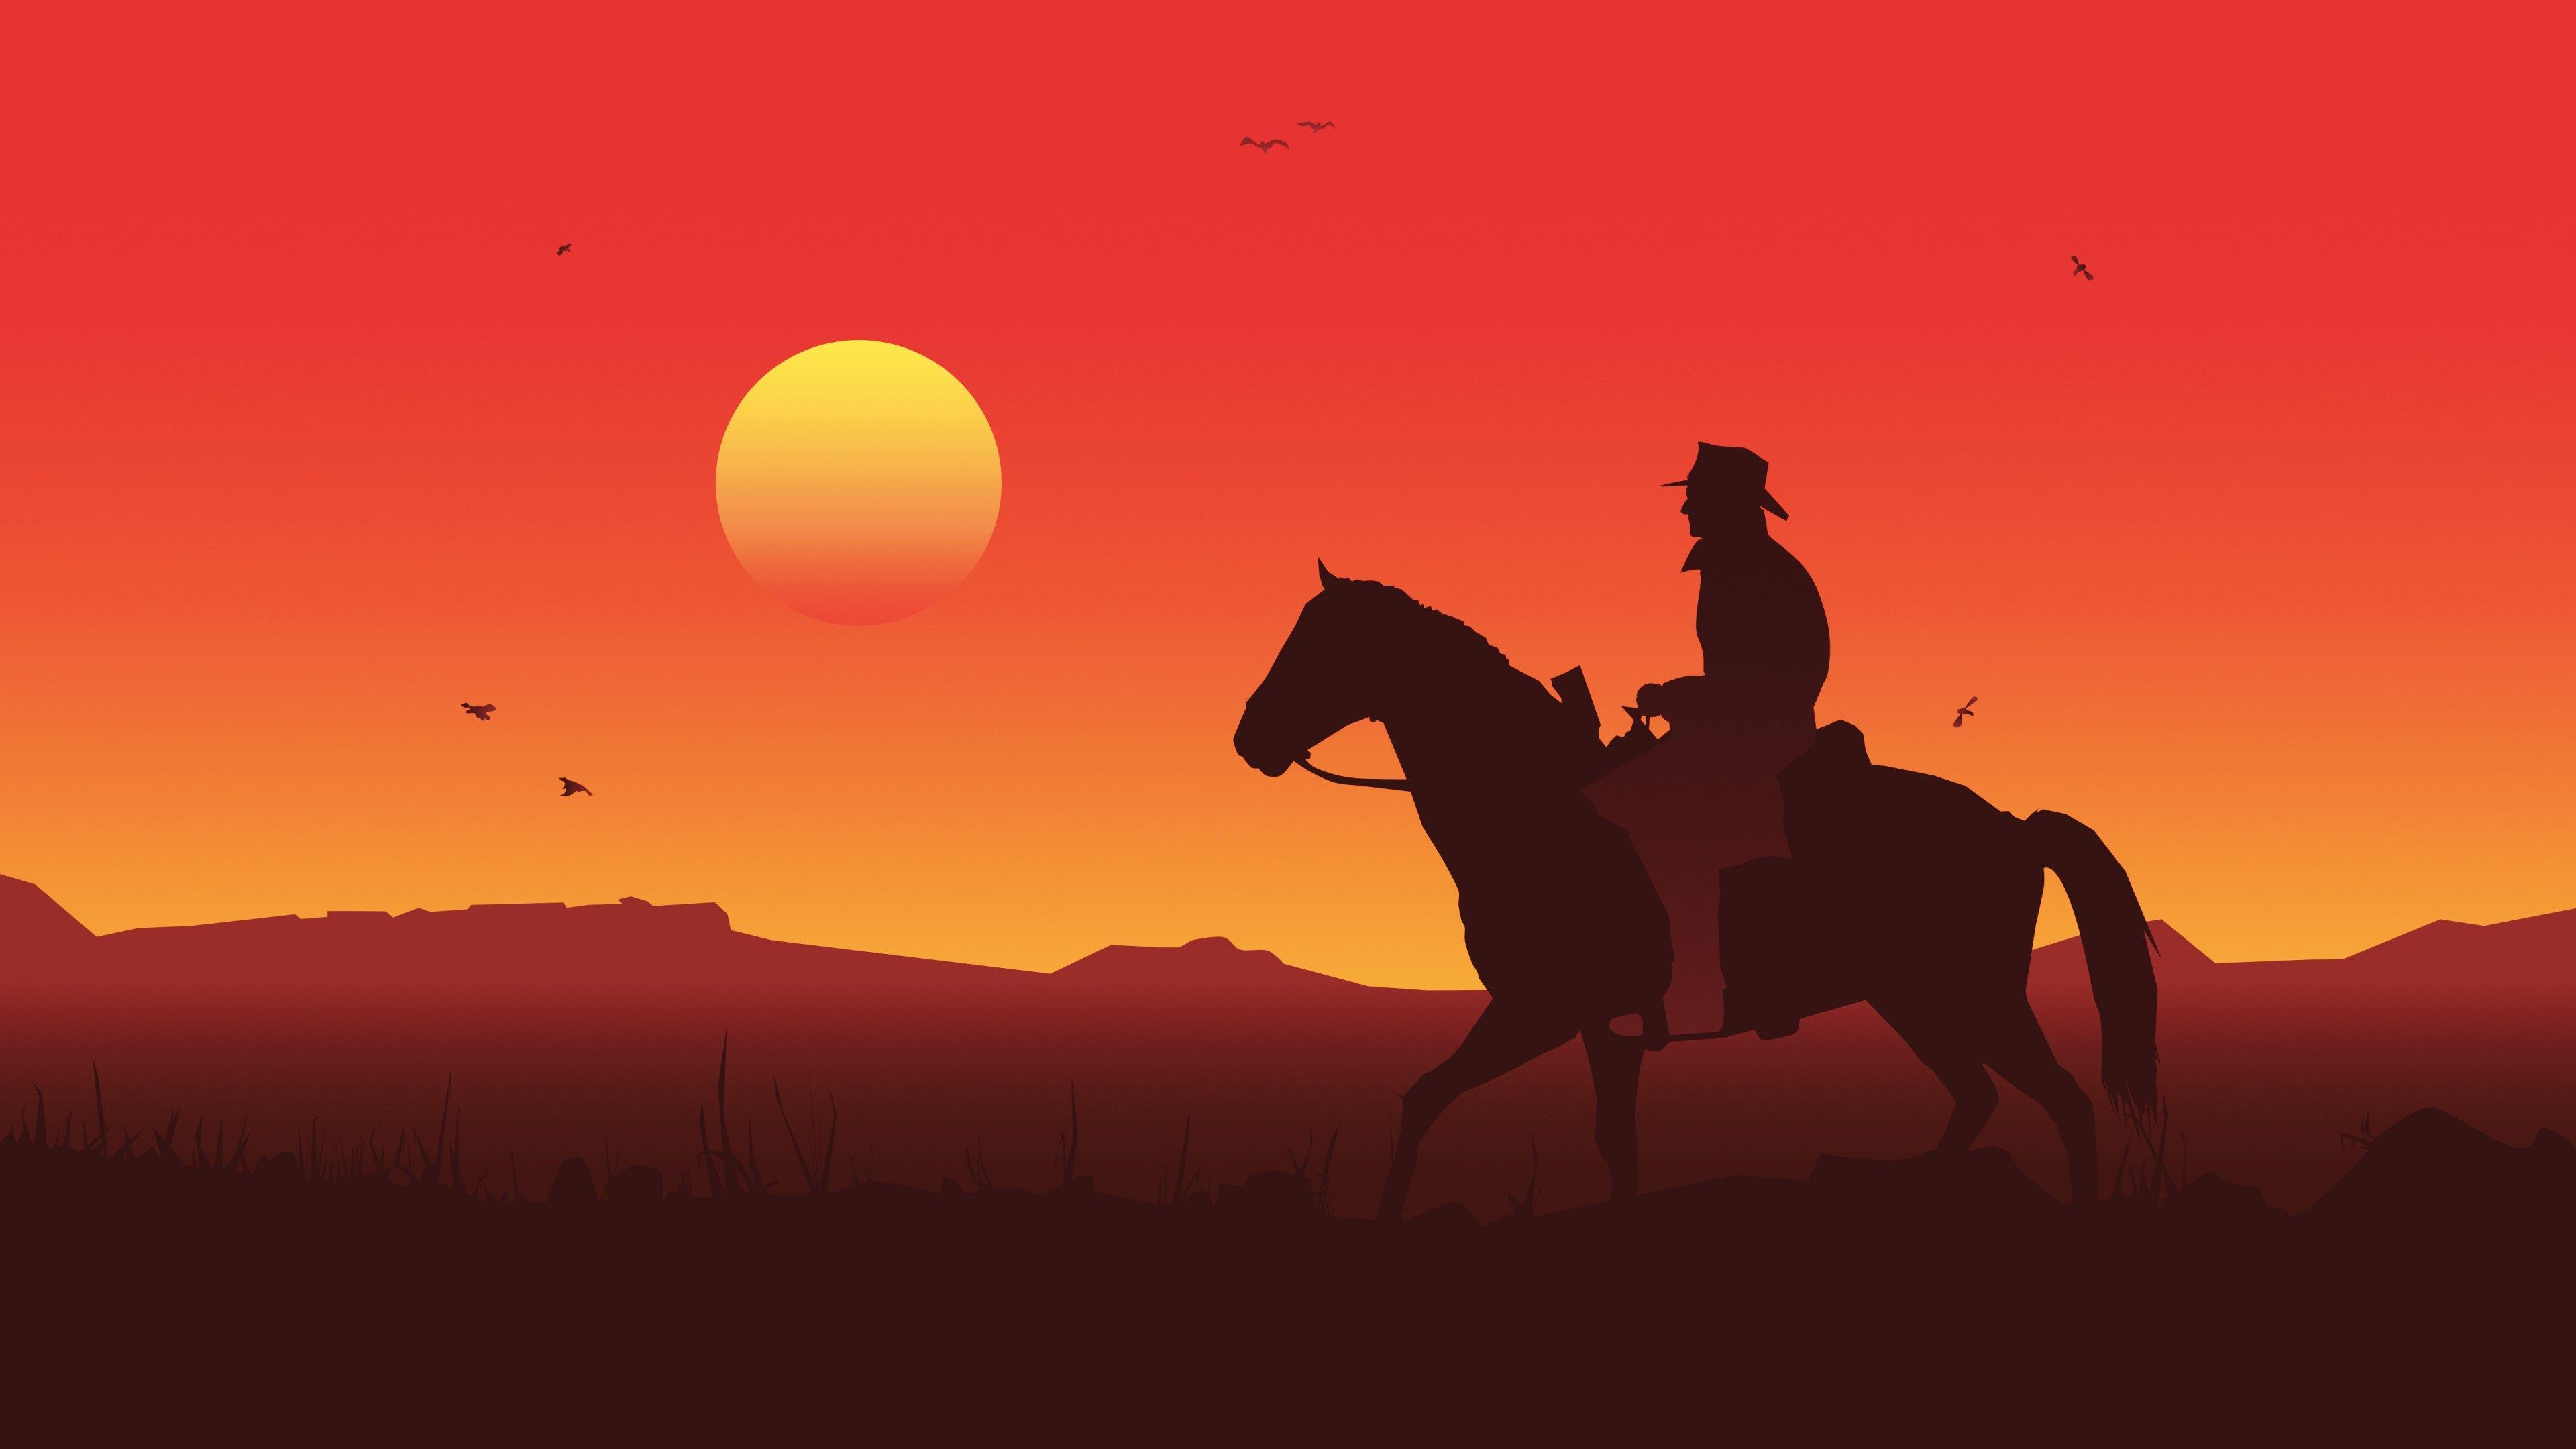 Wallpaper Red Dead Redemption 2 Arthur Morgan Outlaws